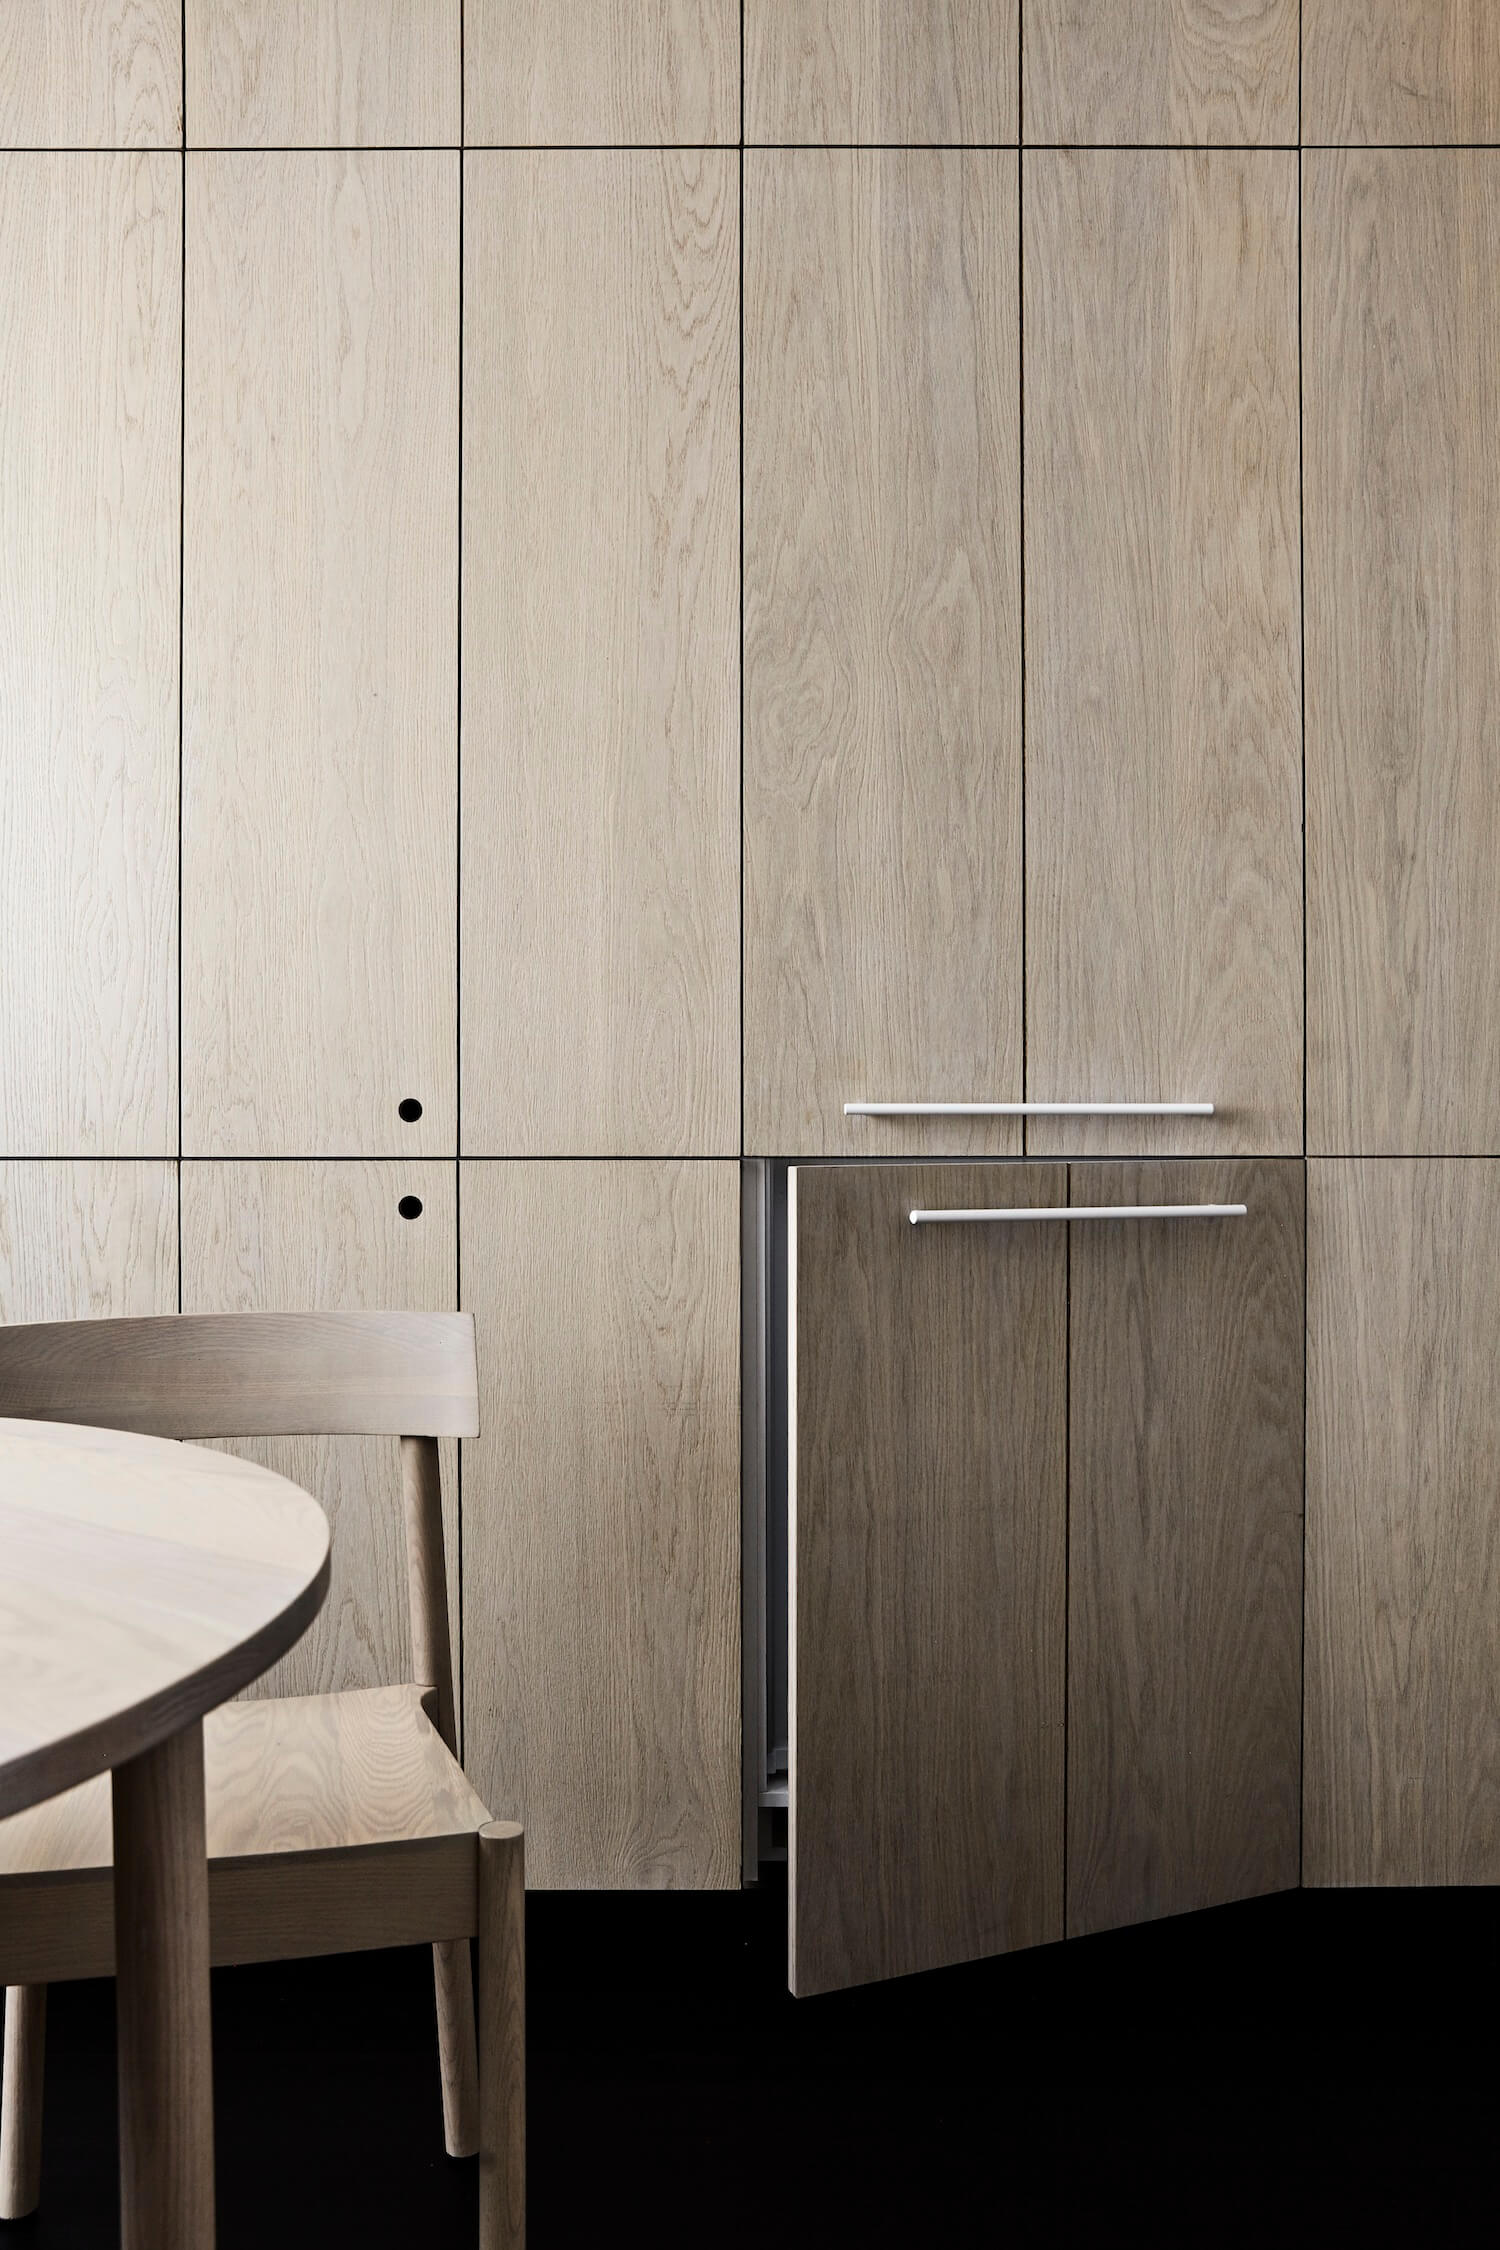 est living hotham street carole whiting interiors whiting architects